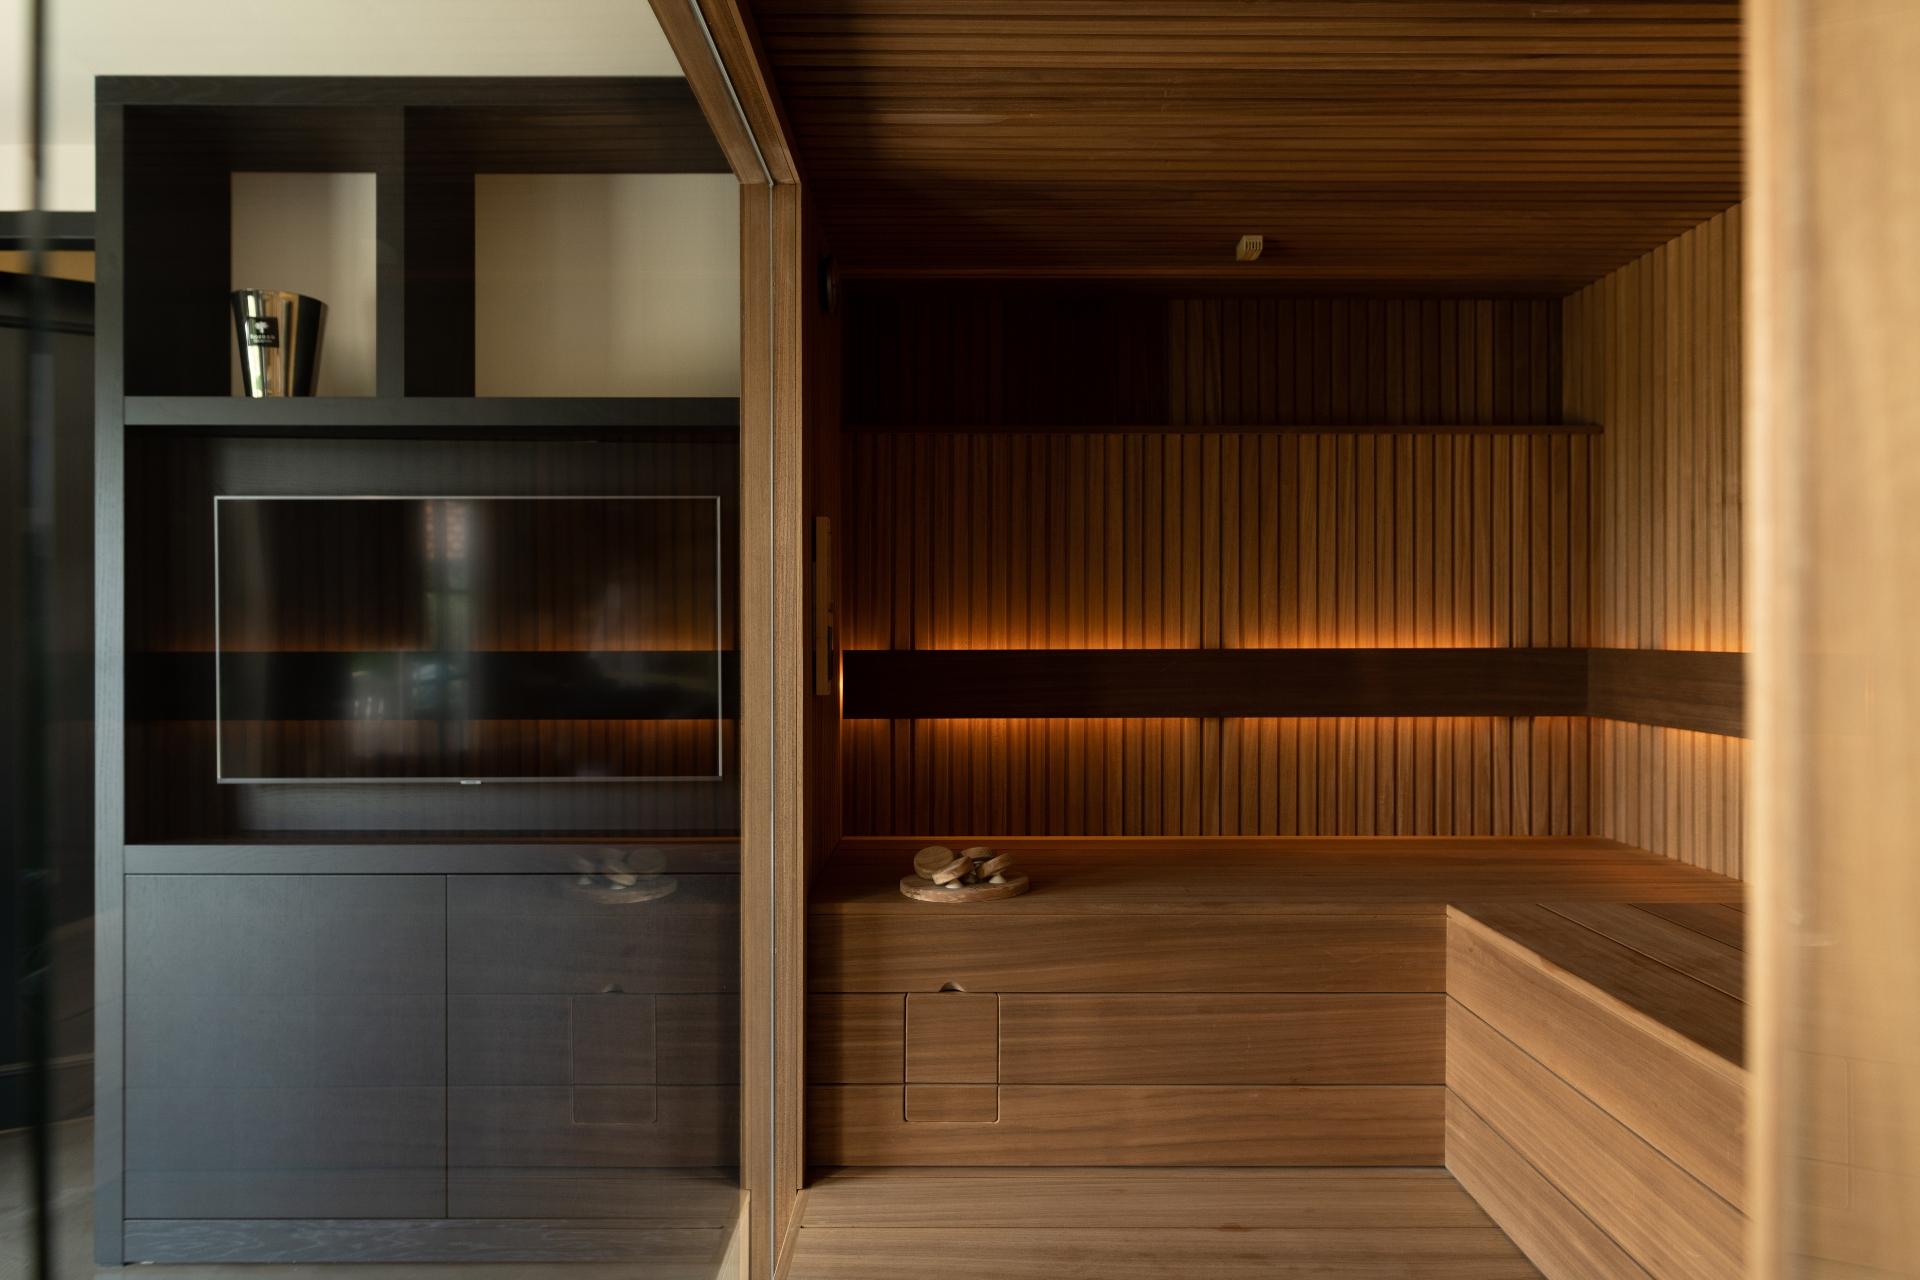 Sauna donker ayous hout met rhombus profiel en glaswand